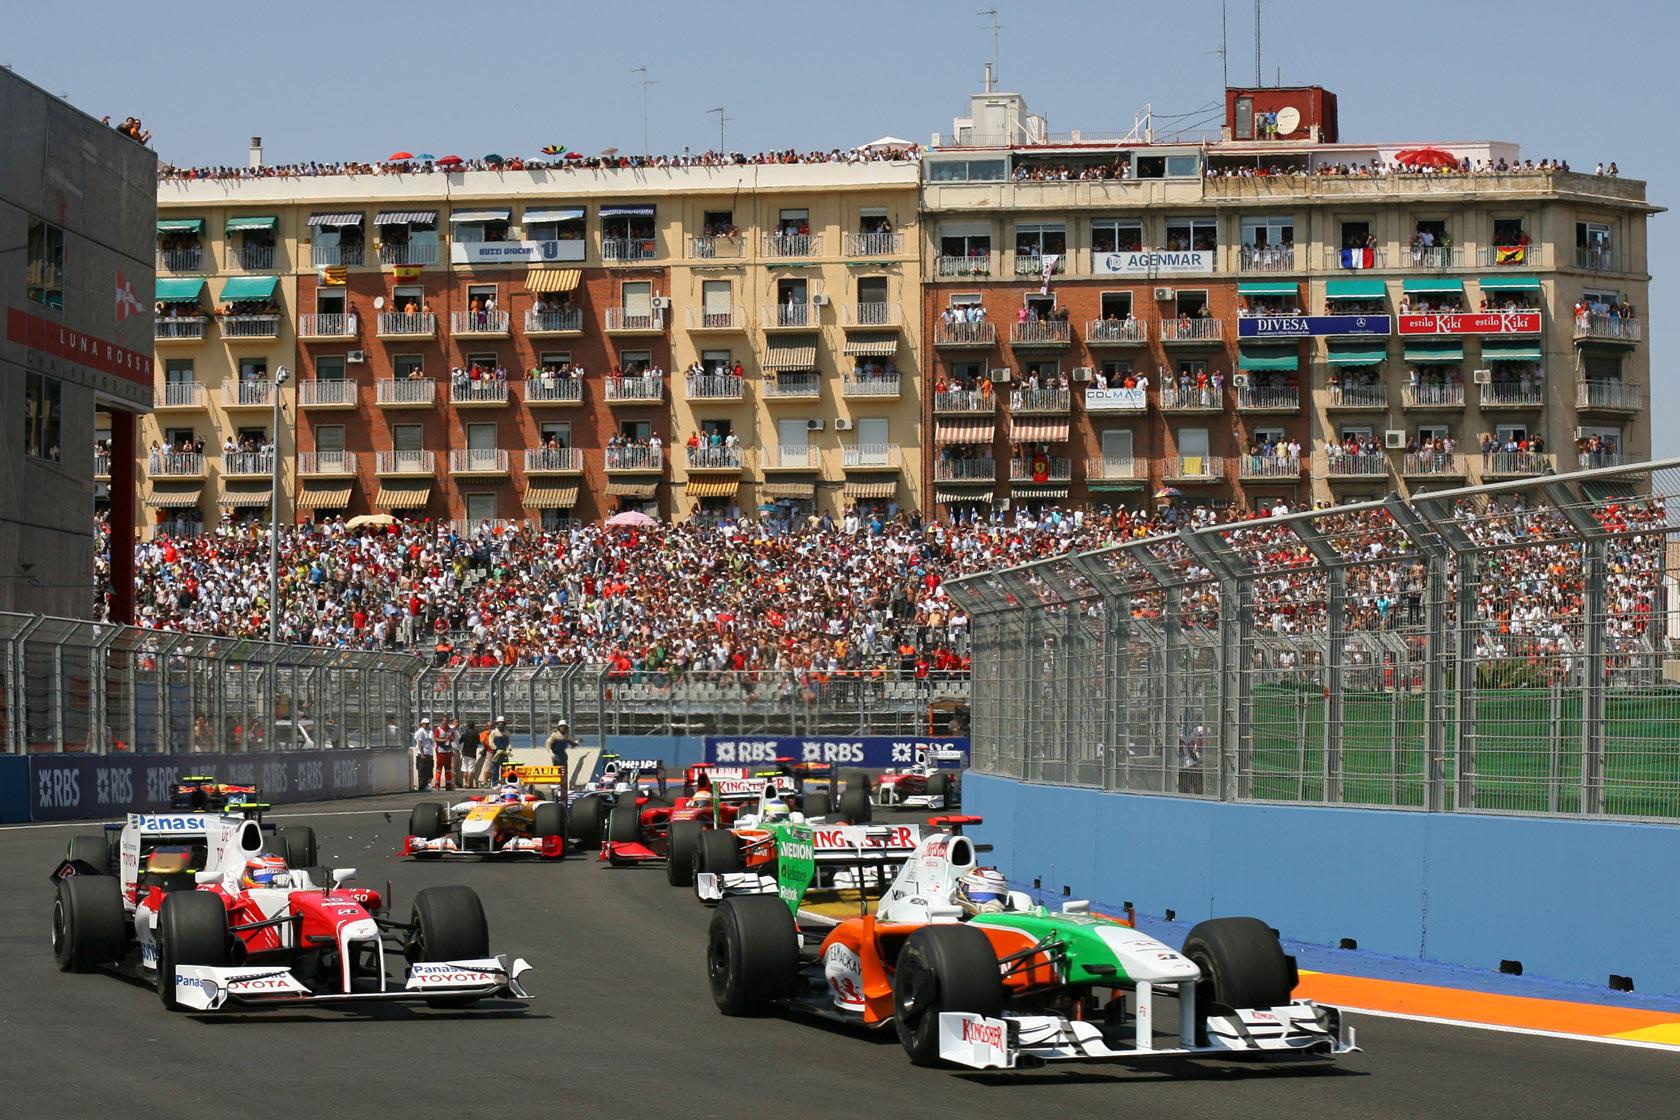 Gran-Premio-de-Europa-de-Formula-1